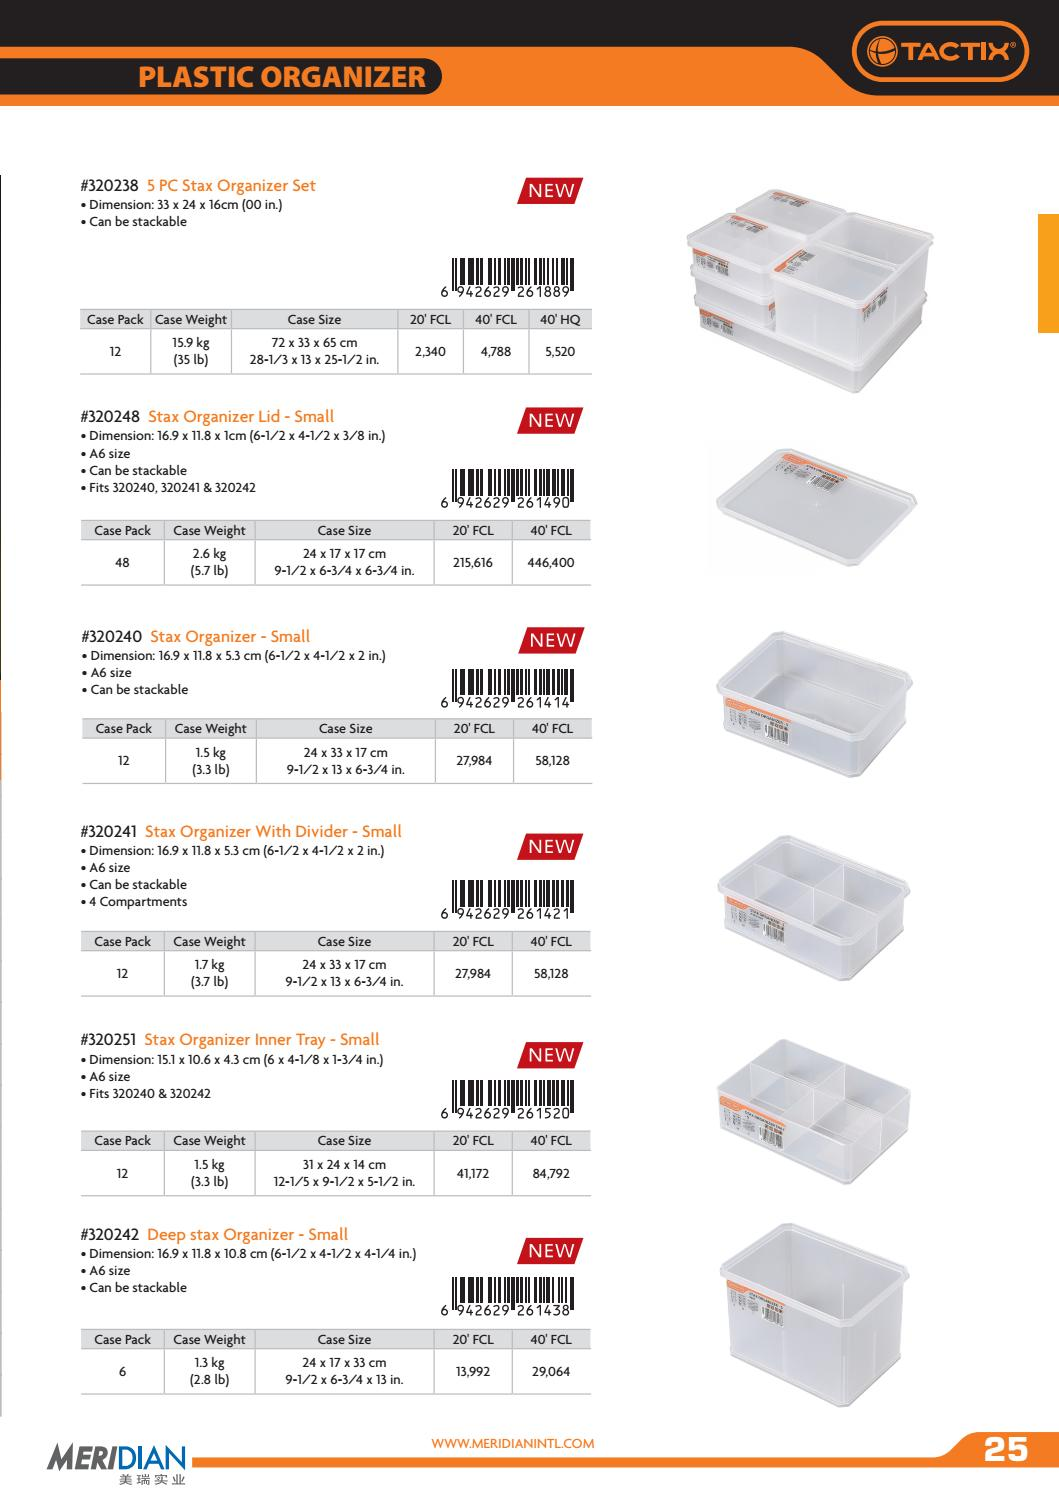 Tactix storage catalogue 2016 by PERNOSTOCK - issuu